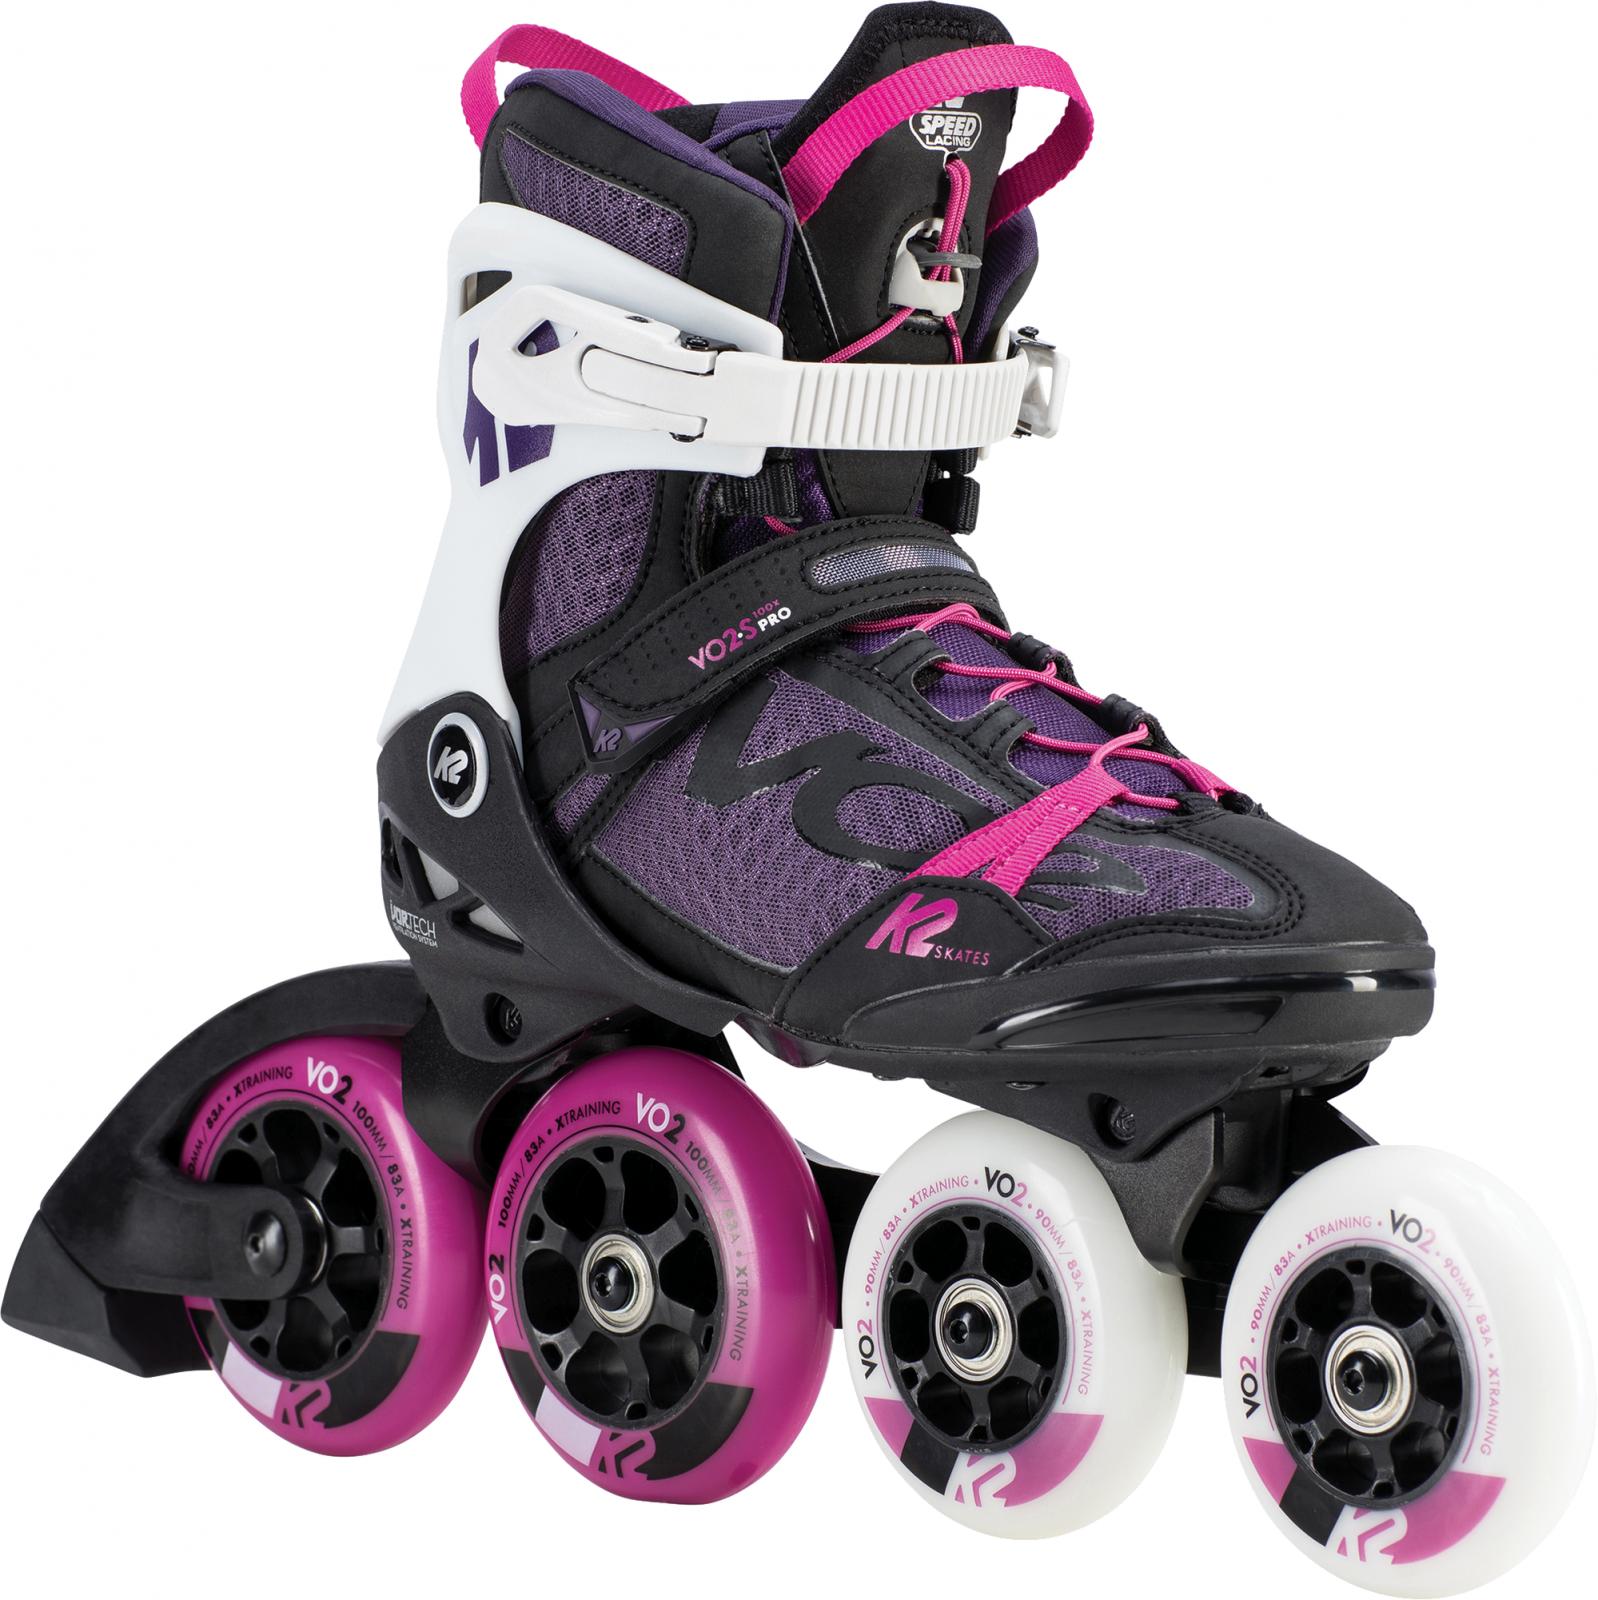 2020 K2 VO2 S 100 X Pro Women's Inline Skates